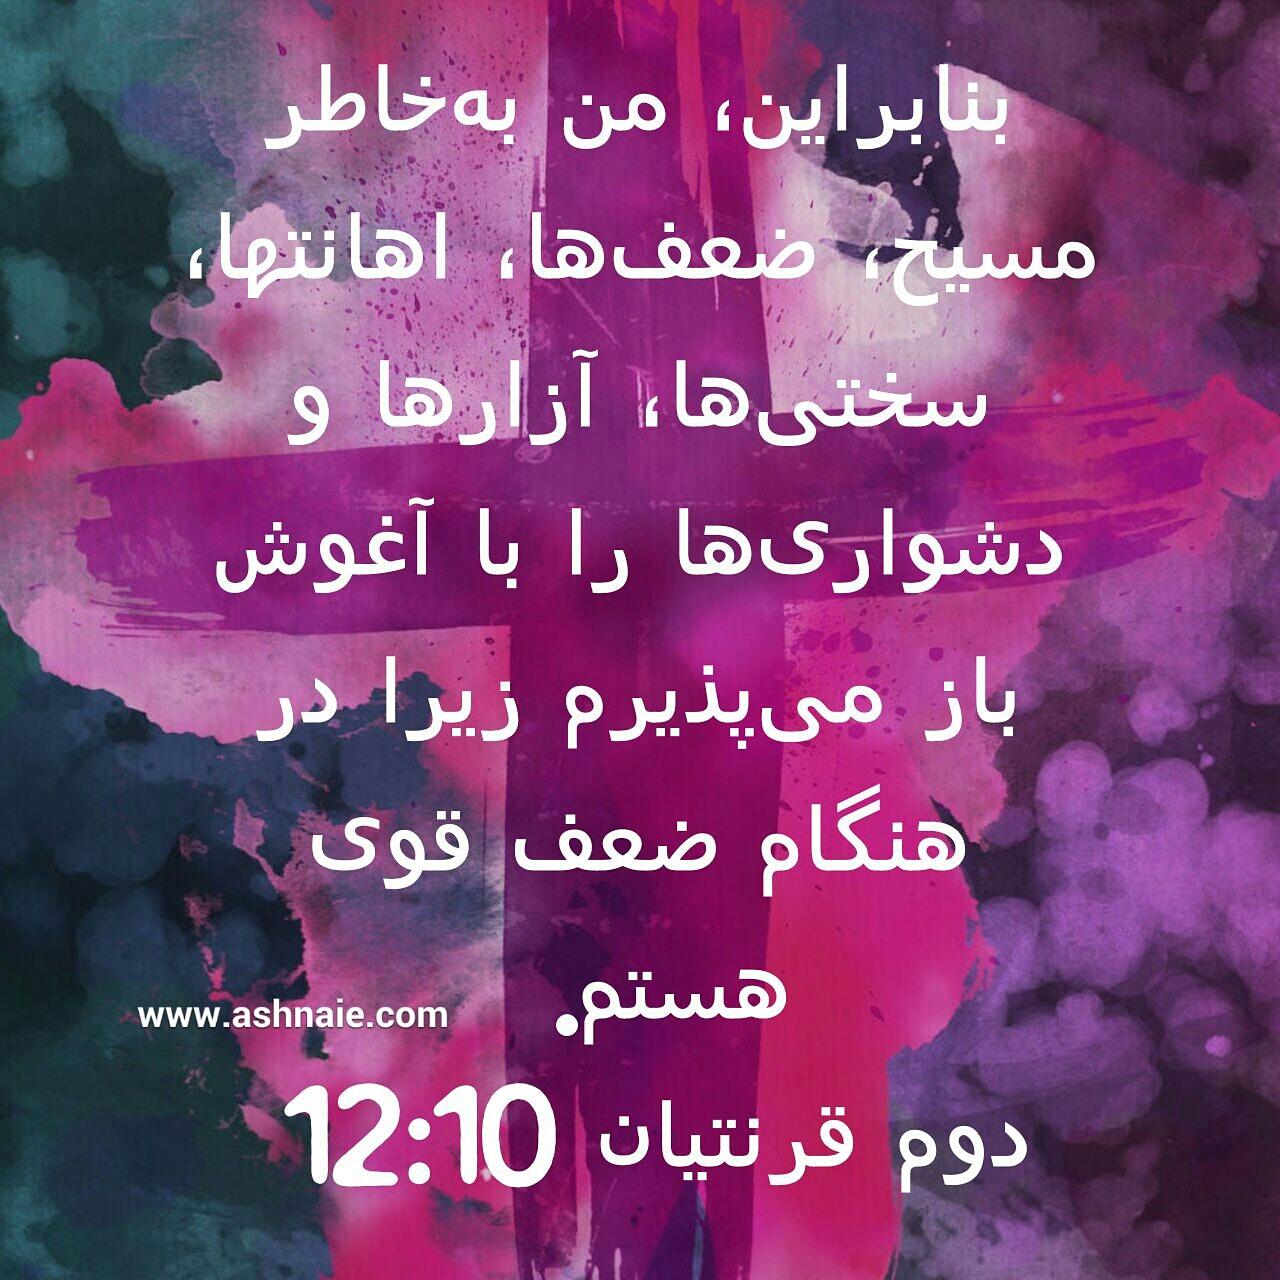 IMG_20181004_232354_080.jpg